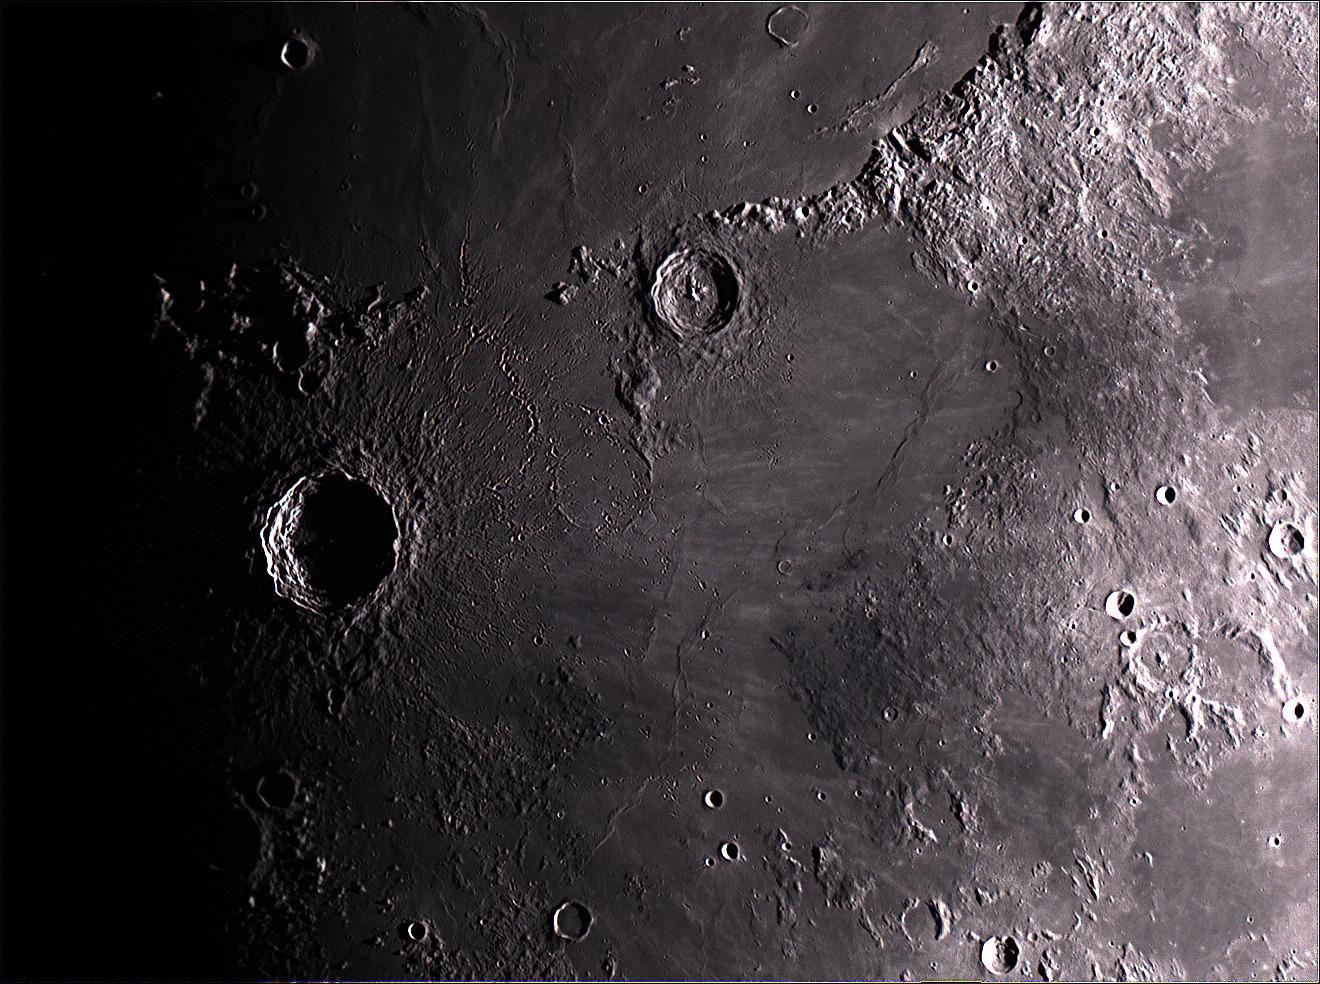 Moon_211047_g4_ap2183.jpg